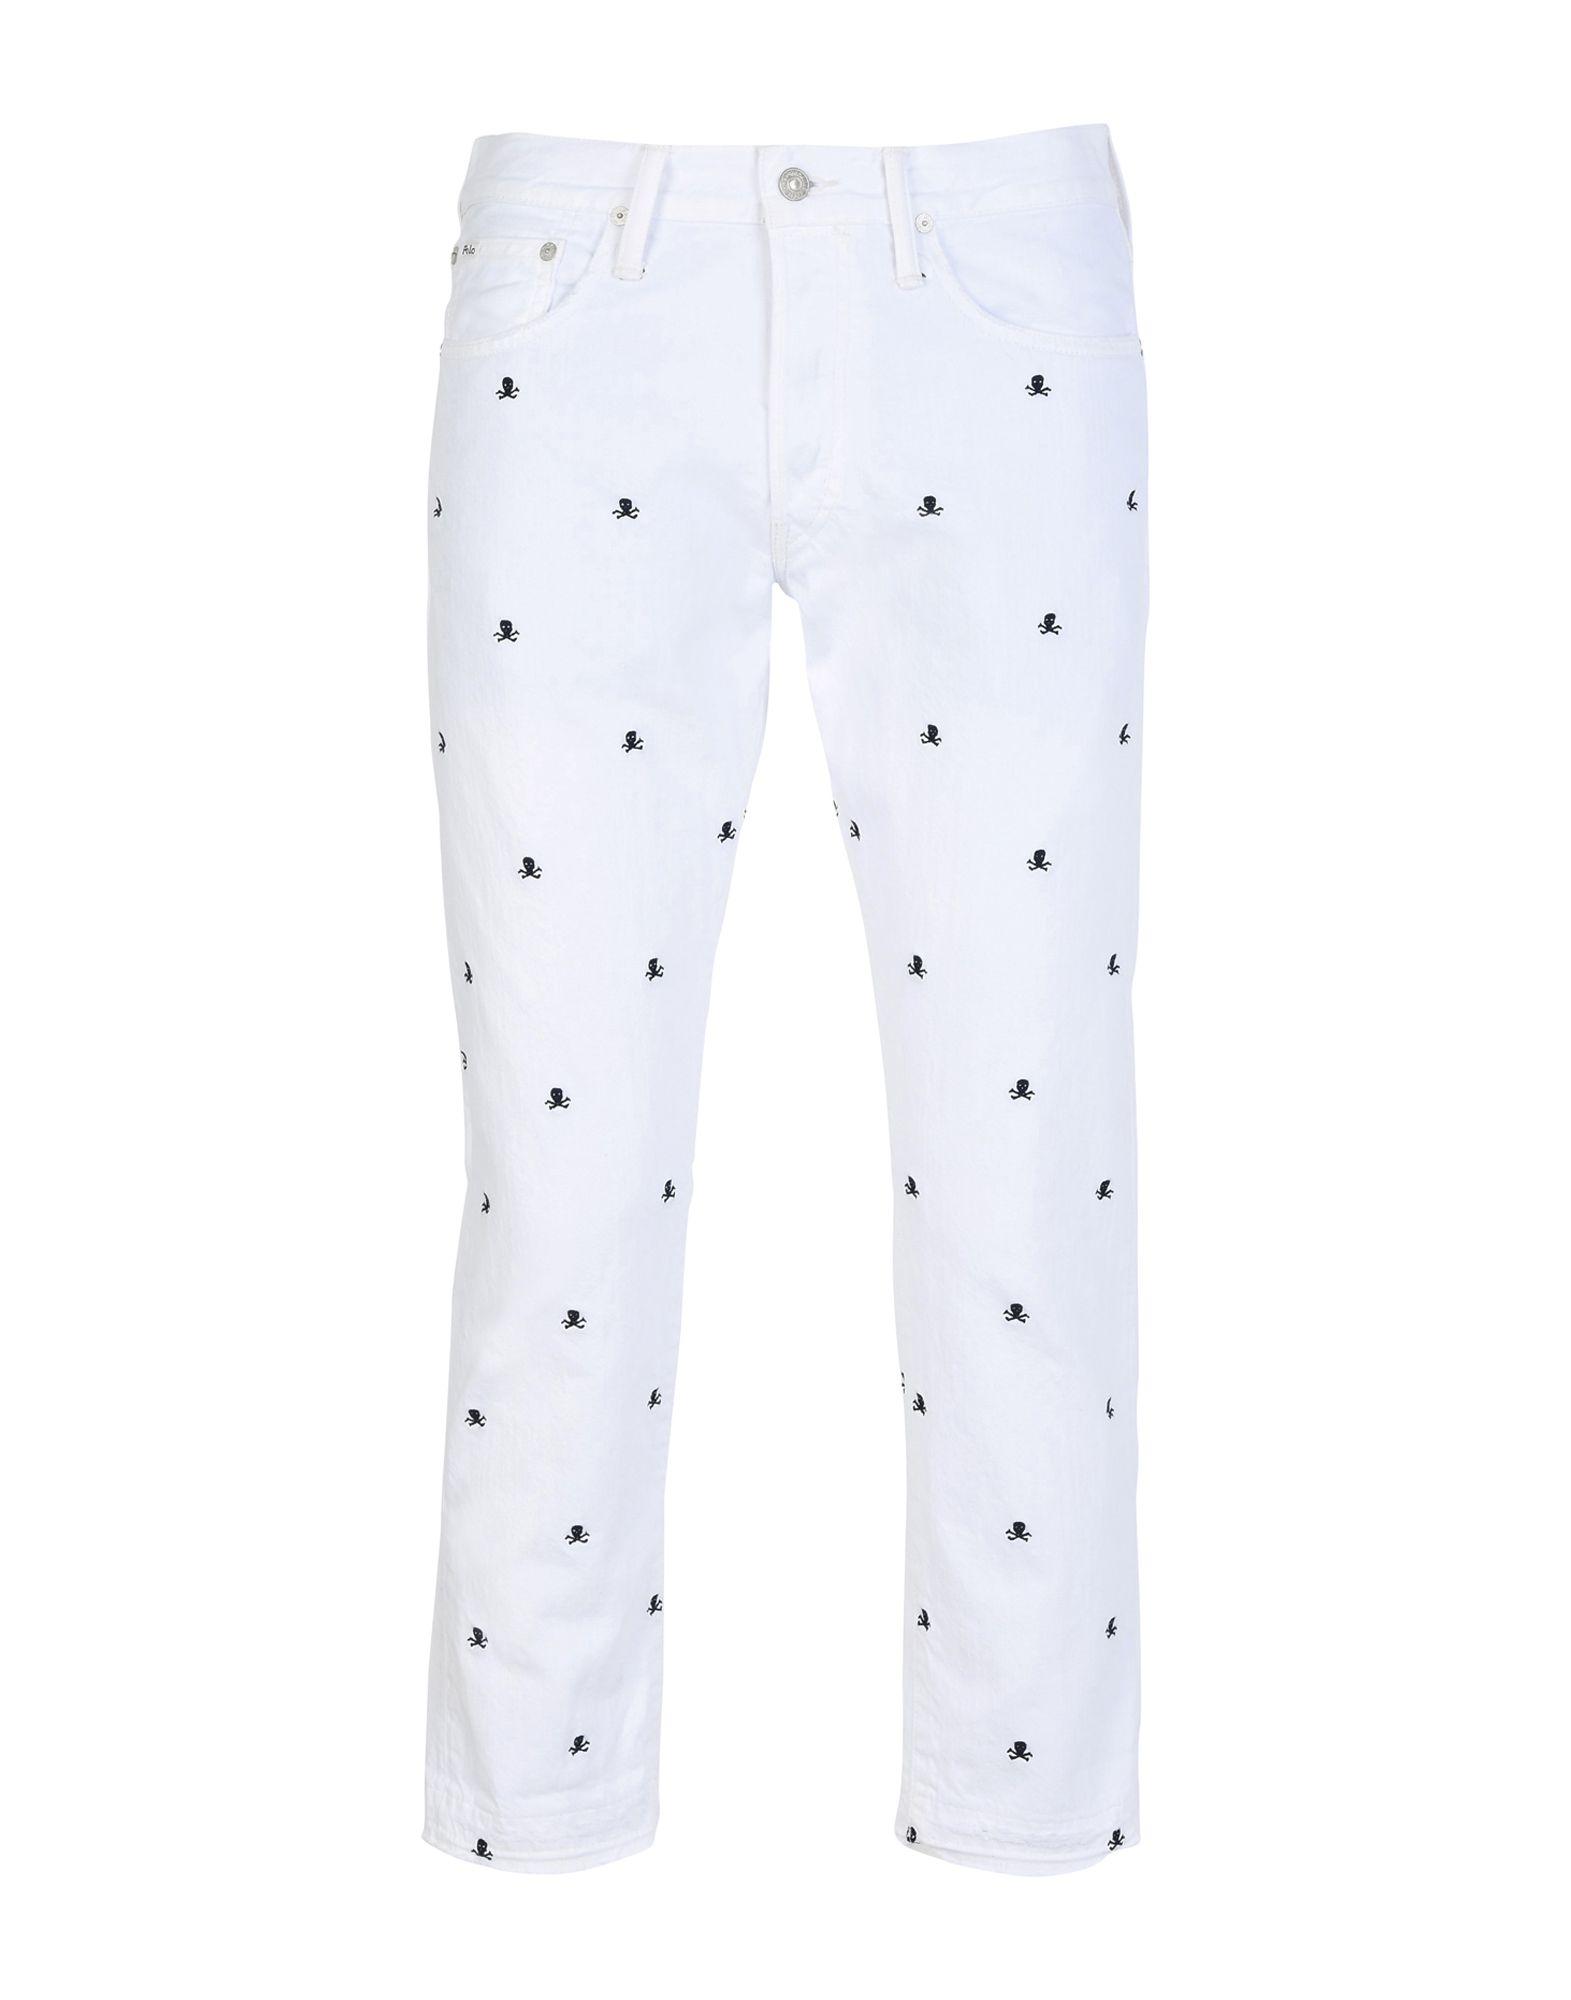 Pantaloni Jeans Polo Ralph Lauren Sullivan Slim Fit Denim - Uomo - Acquista online su